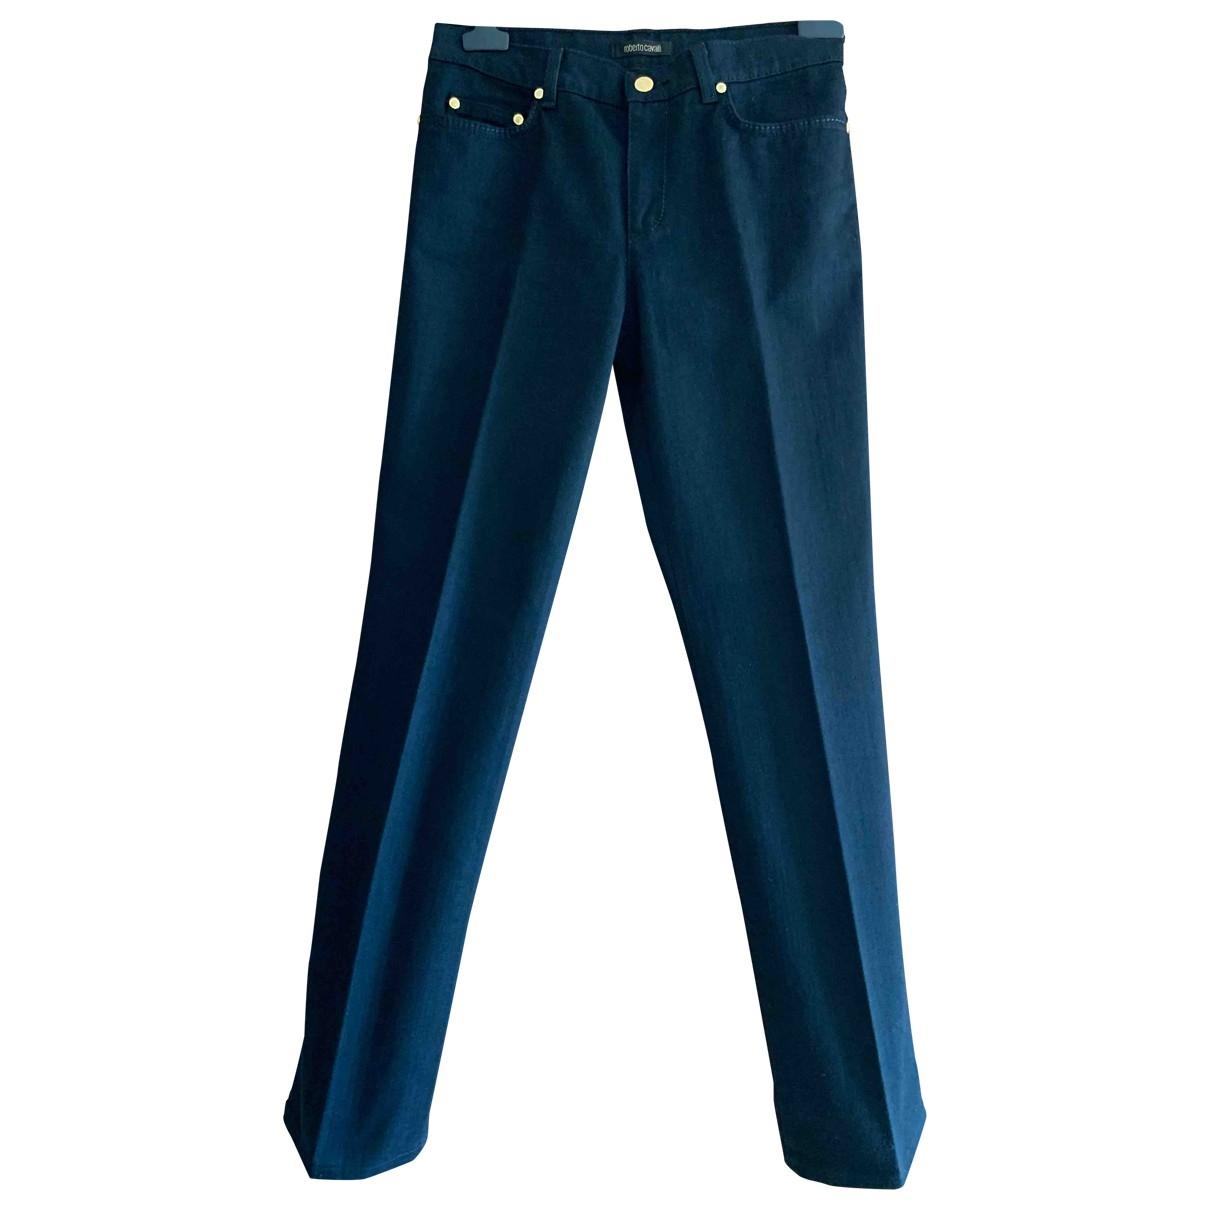 Roberto Cavalli \N Jeans in  Schwarz Baumwolle - Elasthan